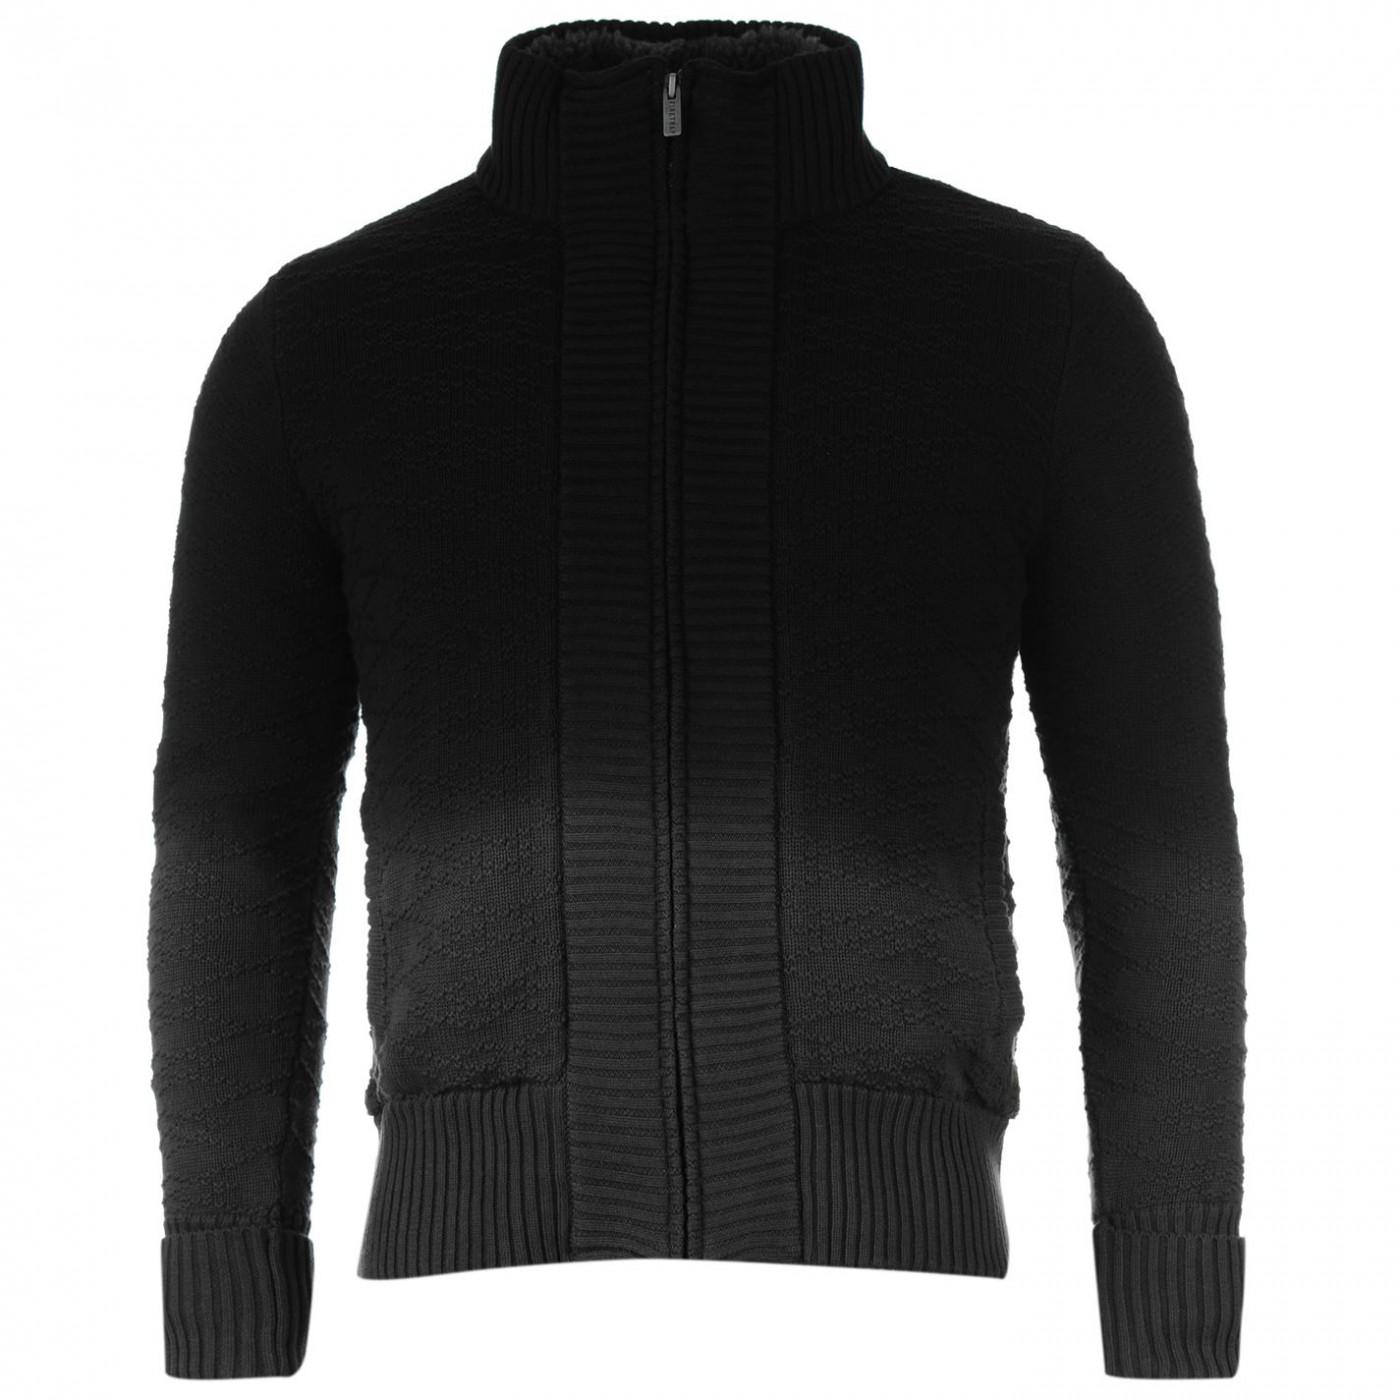 hoodie Firetrap 2 Zip Knitted Cardigan